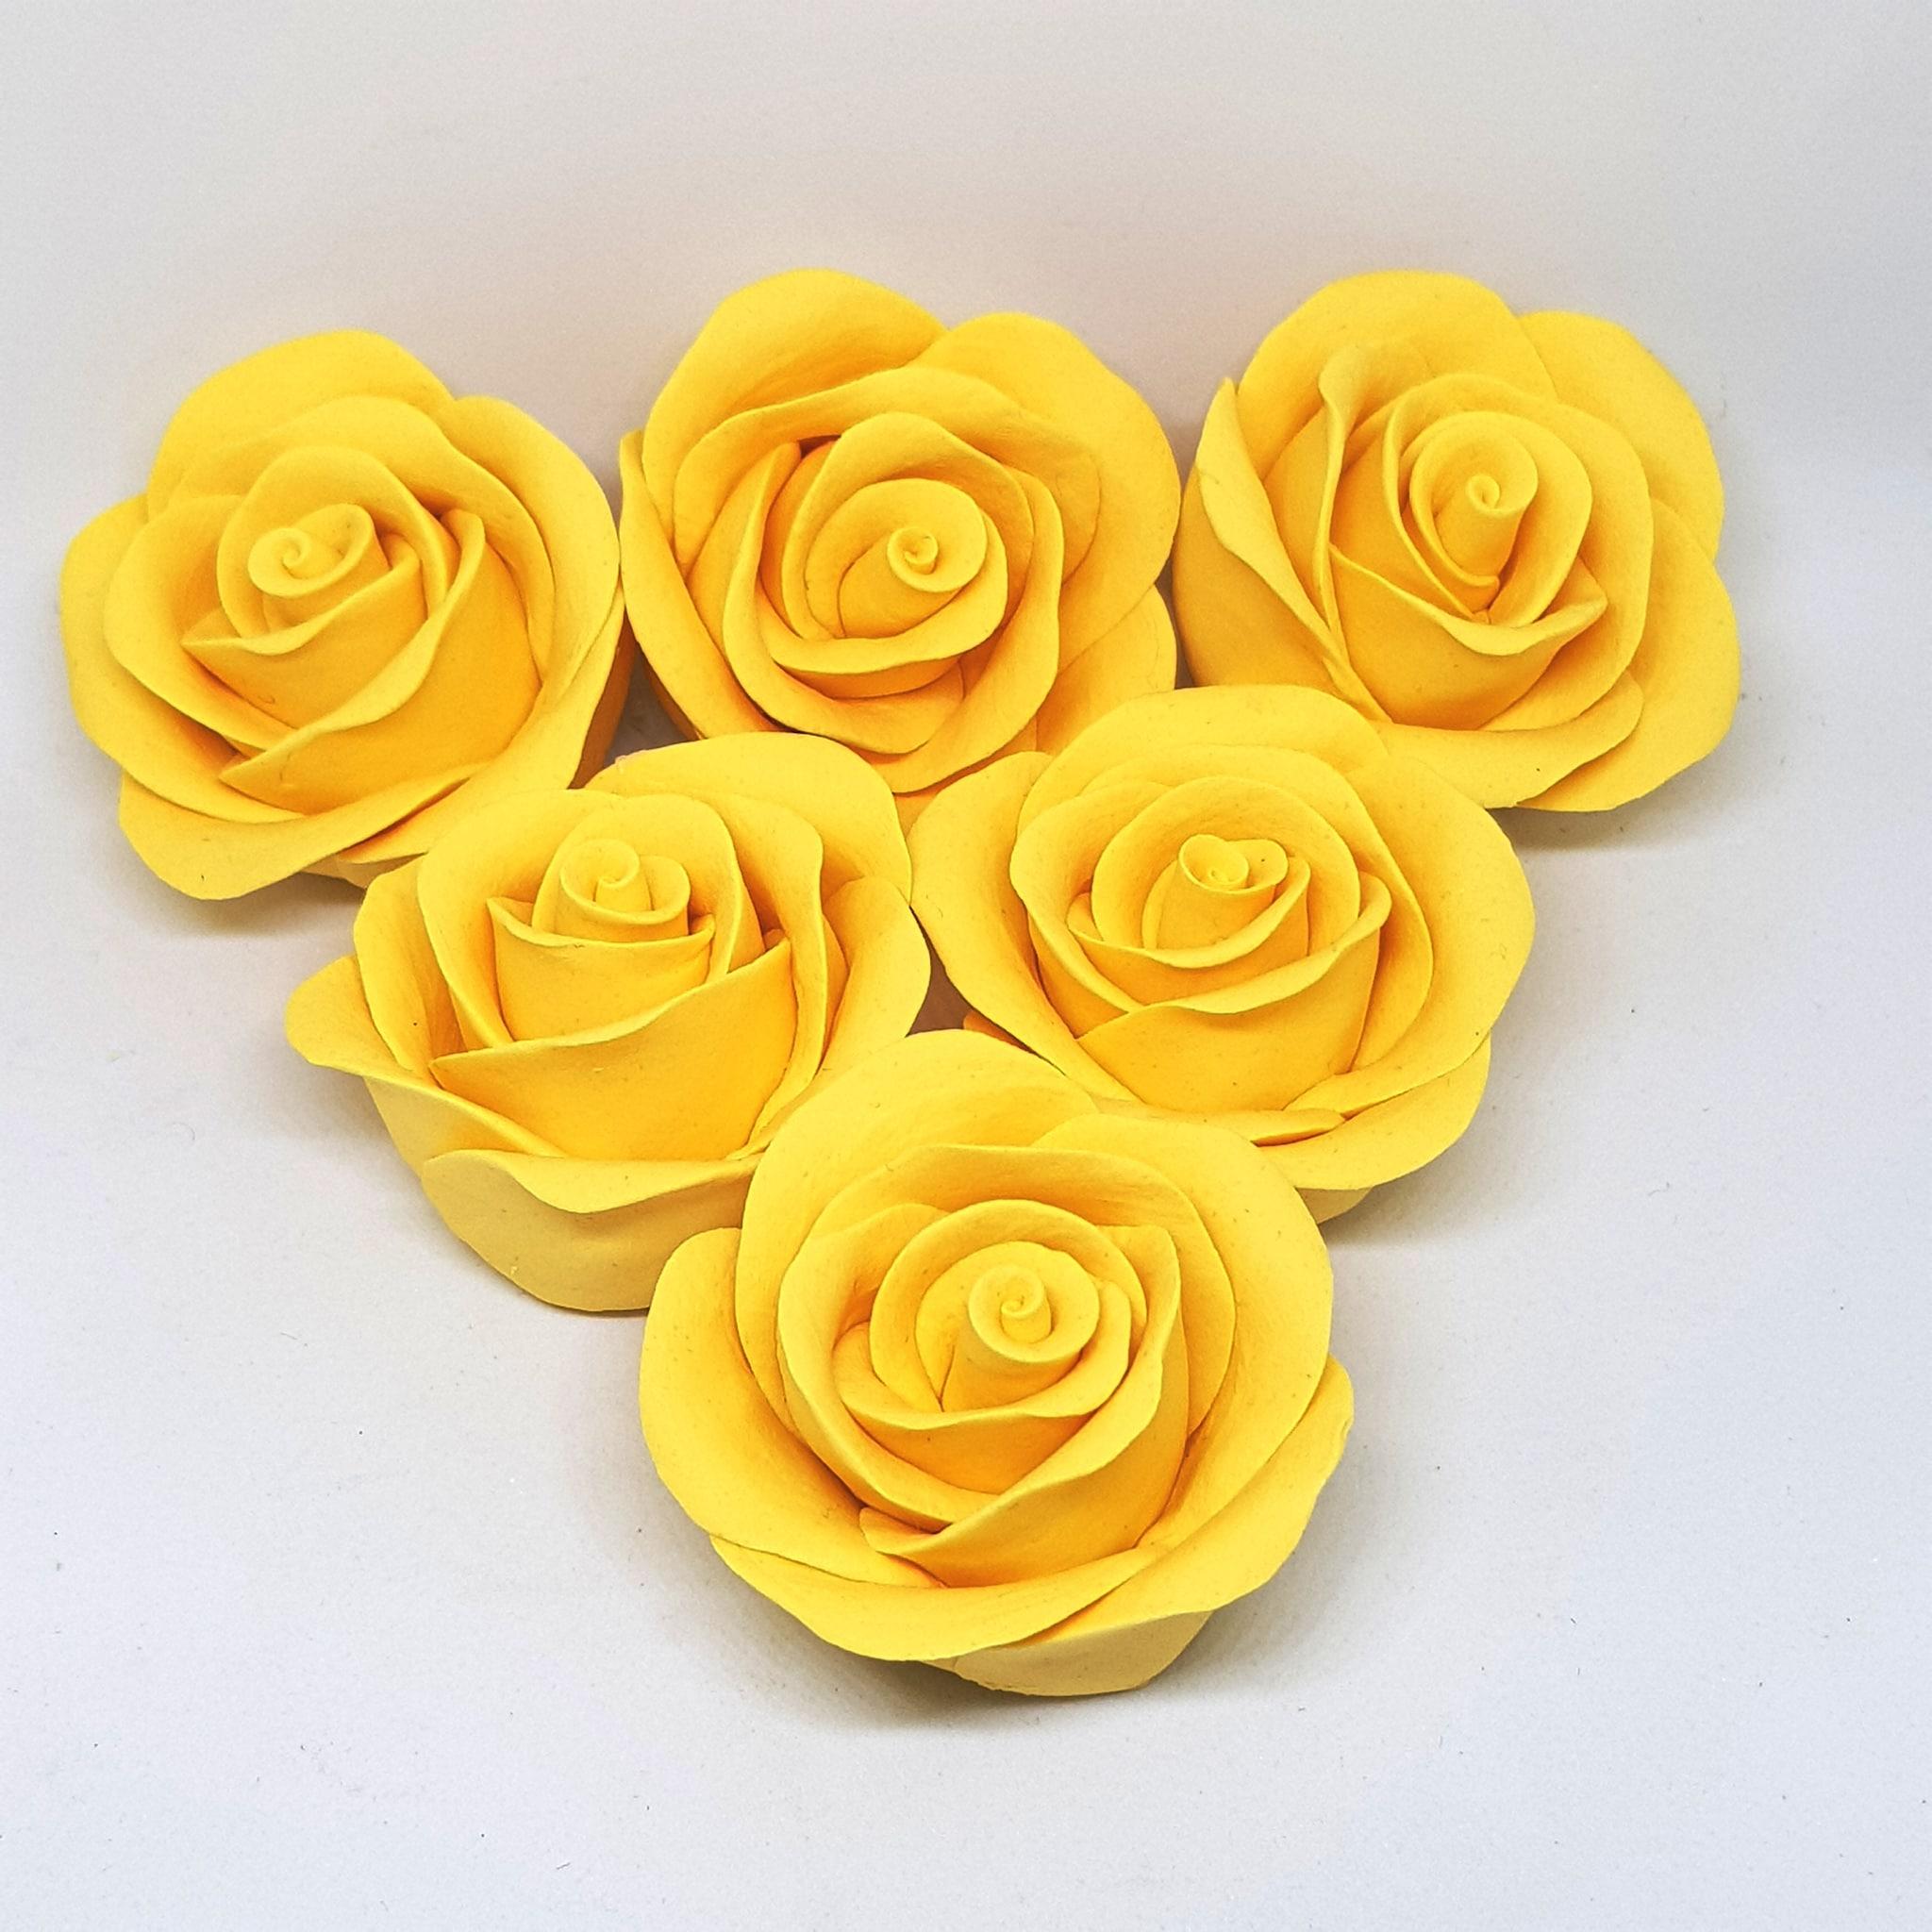 Handmade Rose Colour Sugarcraft (Yellow)